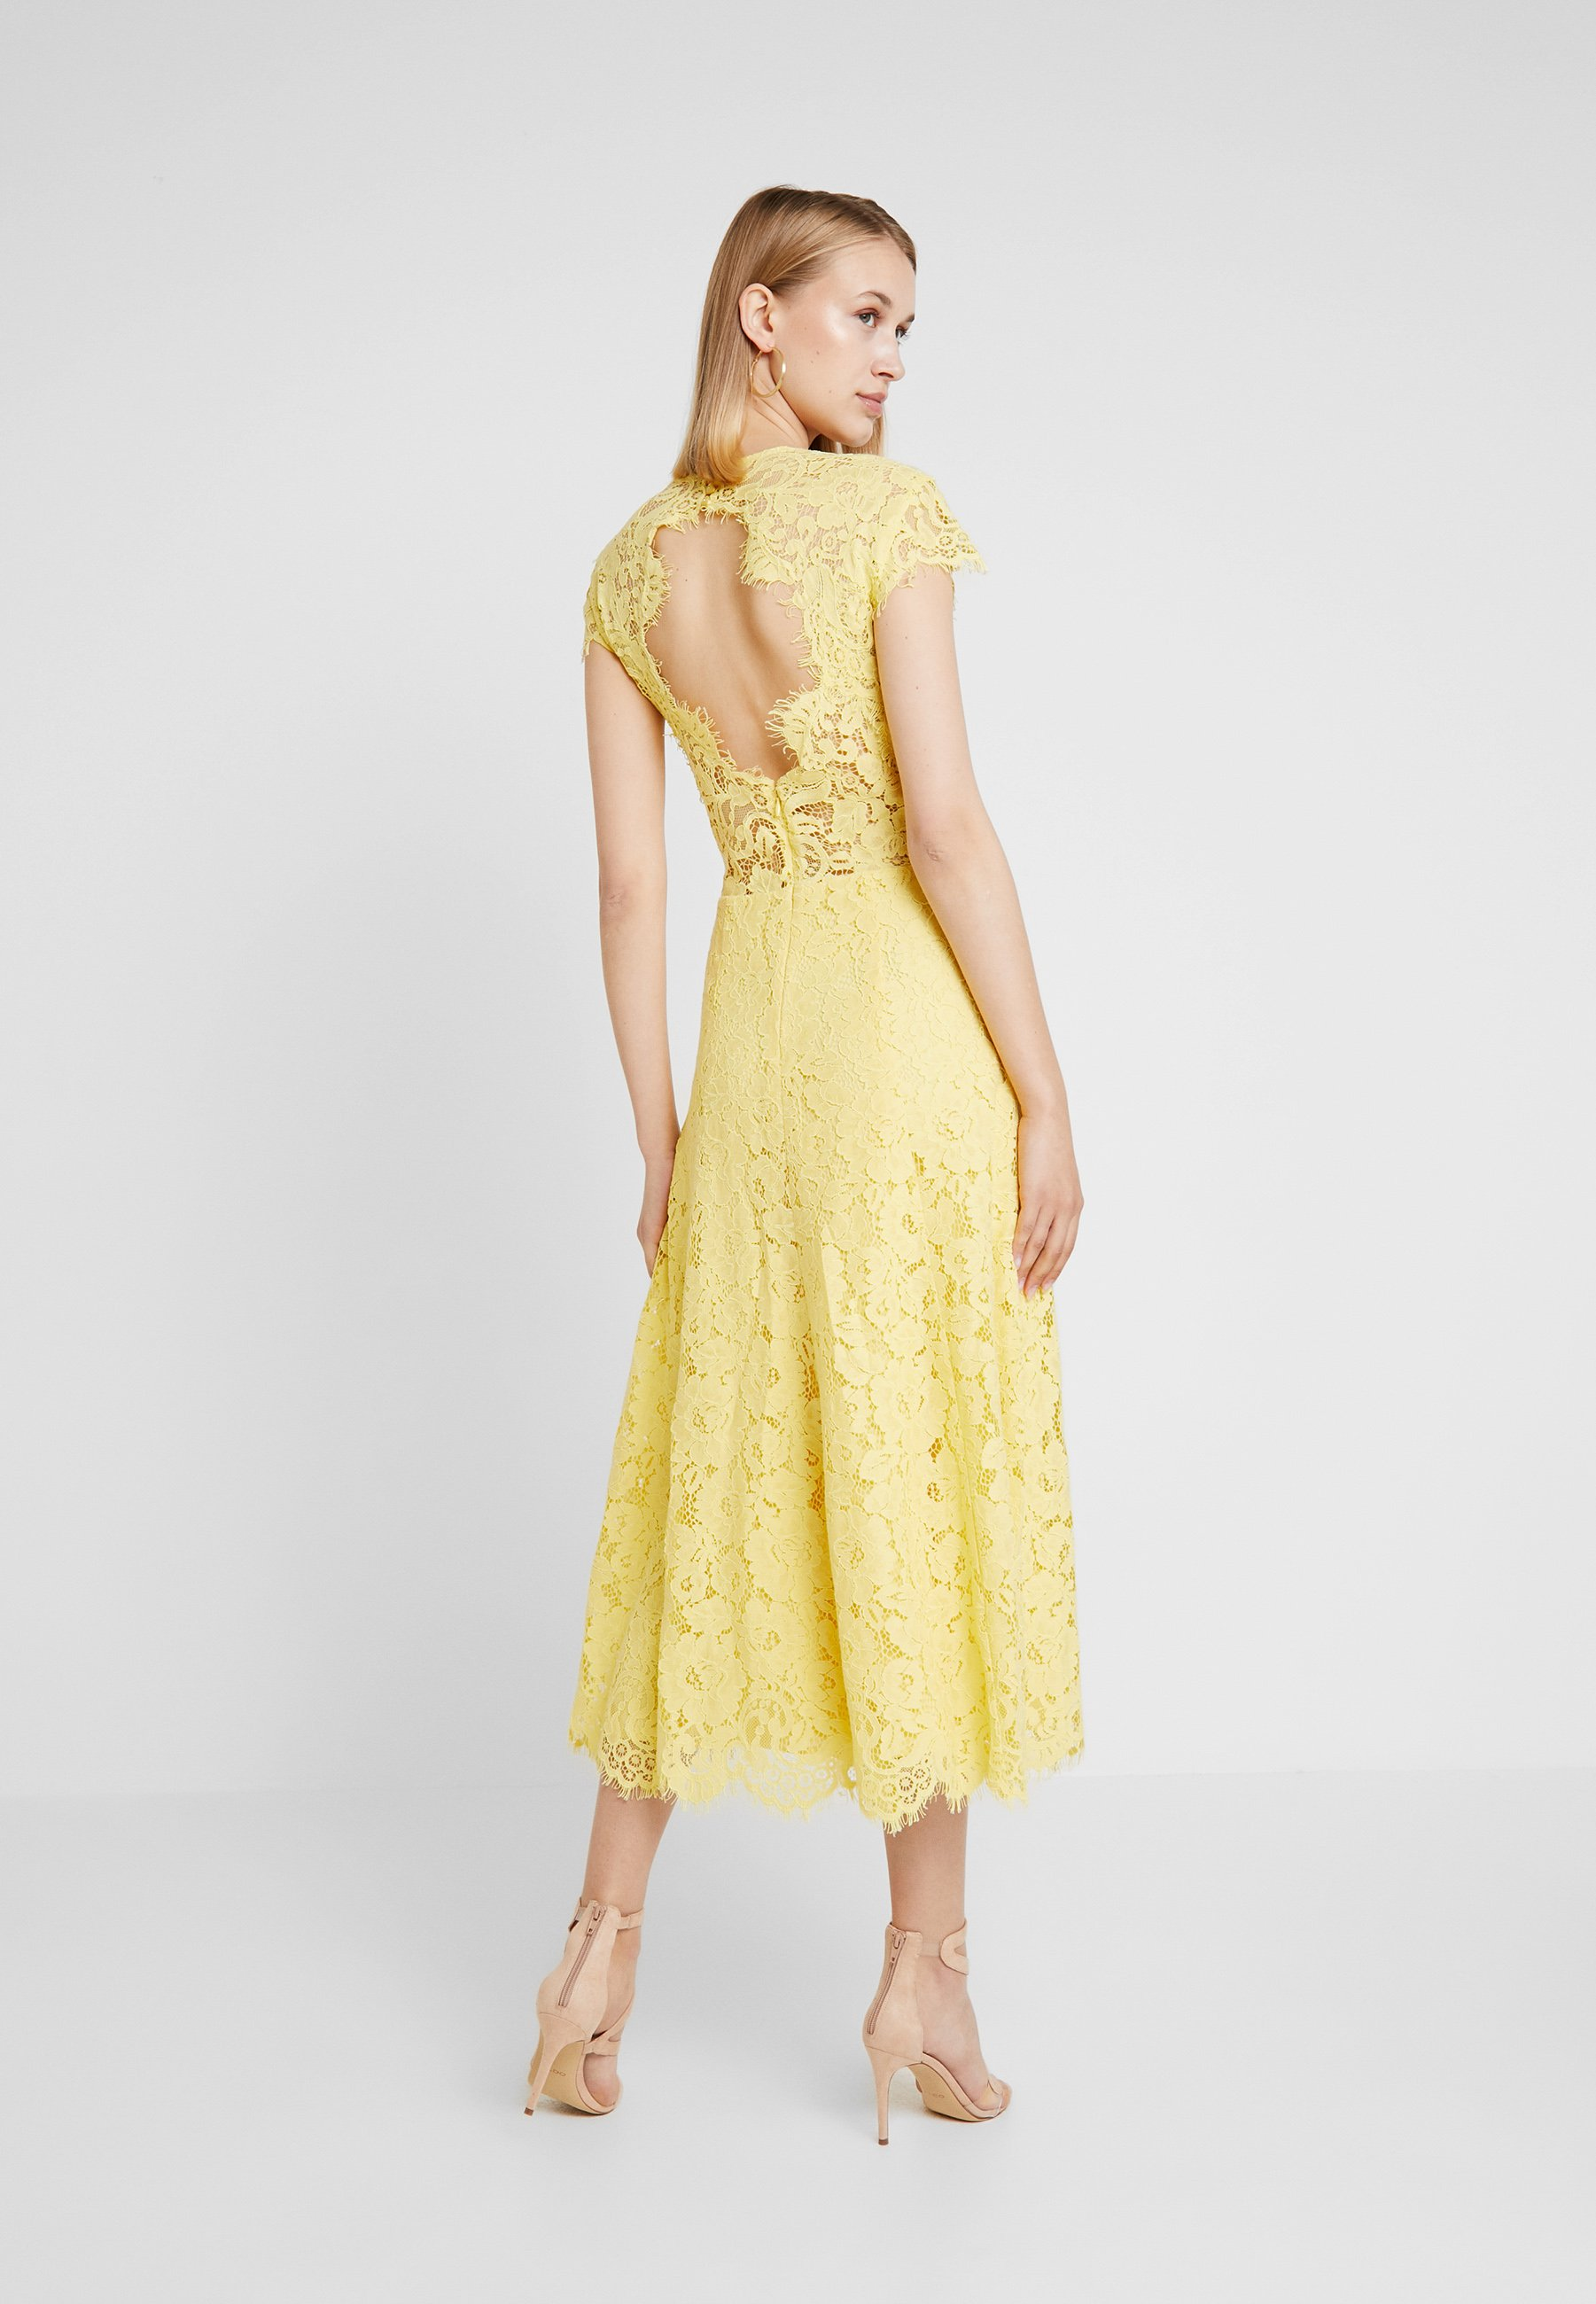 Oak Cap Ivyamp; Dress Flared Yellow Cocktail Sunshine SleeveRobe De IvgfbyY76